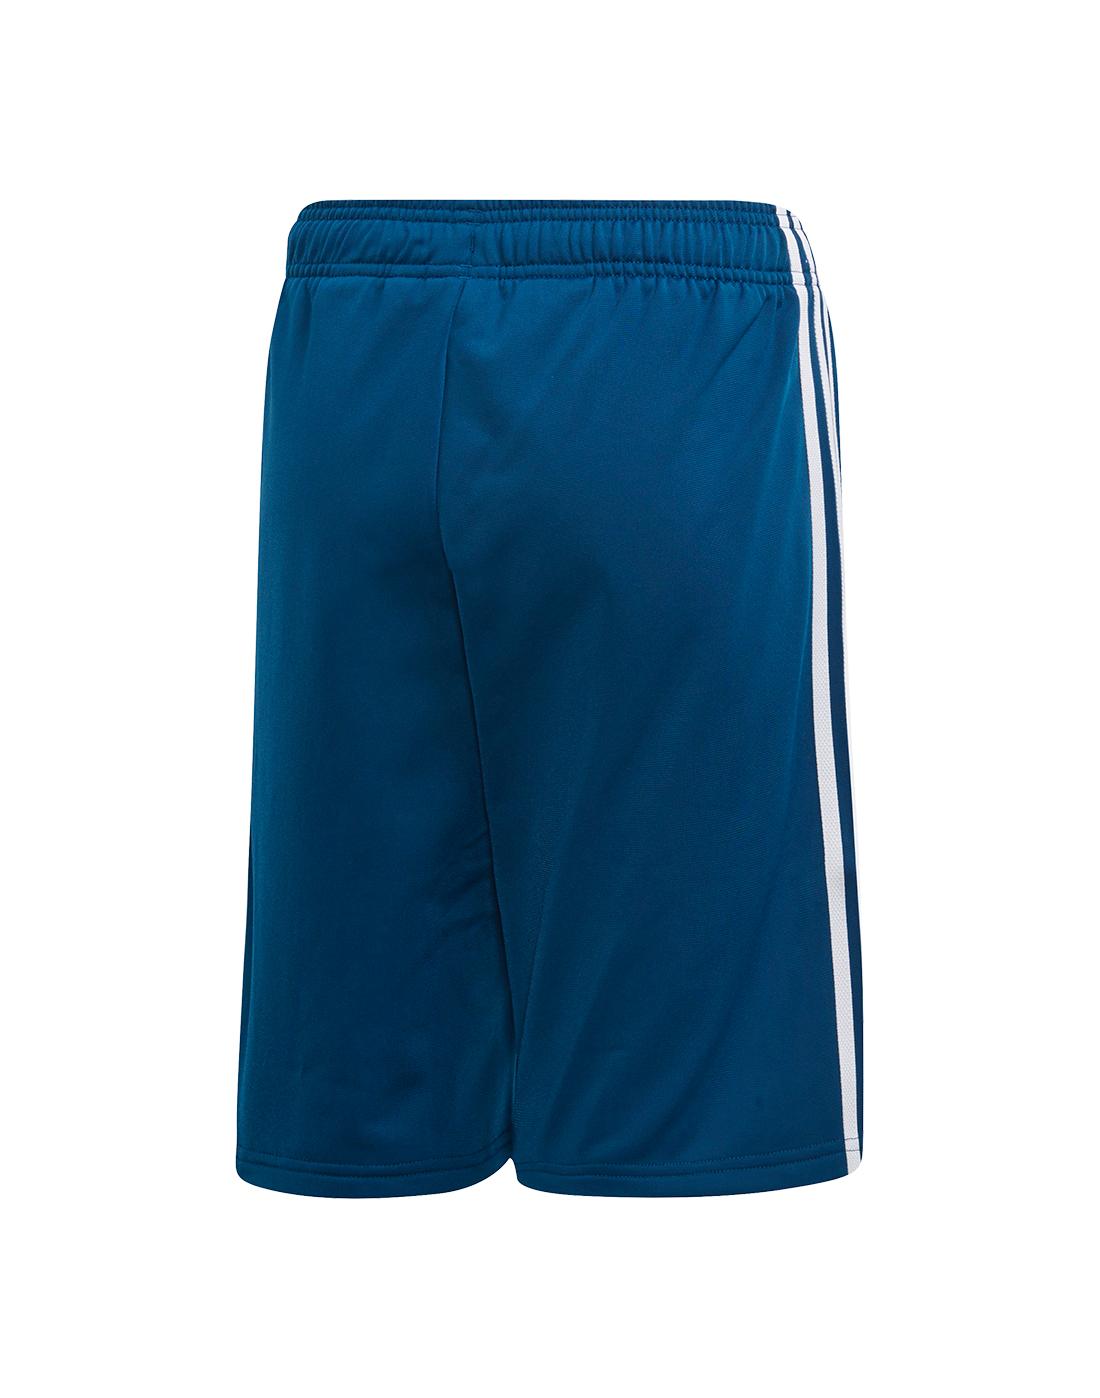 e6afbfcce8 adidas Originals Older Boys Trefoil 3-Stripe Shorts | Life Style Sports